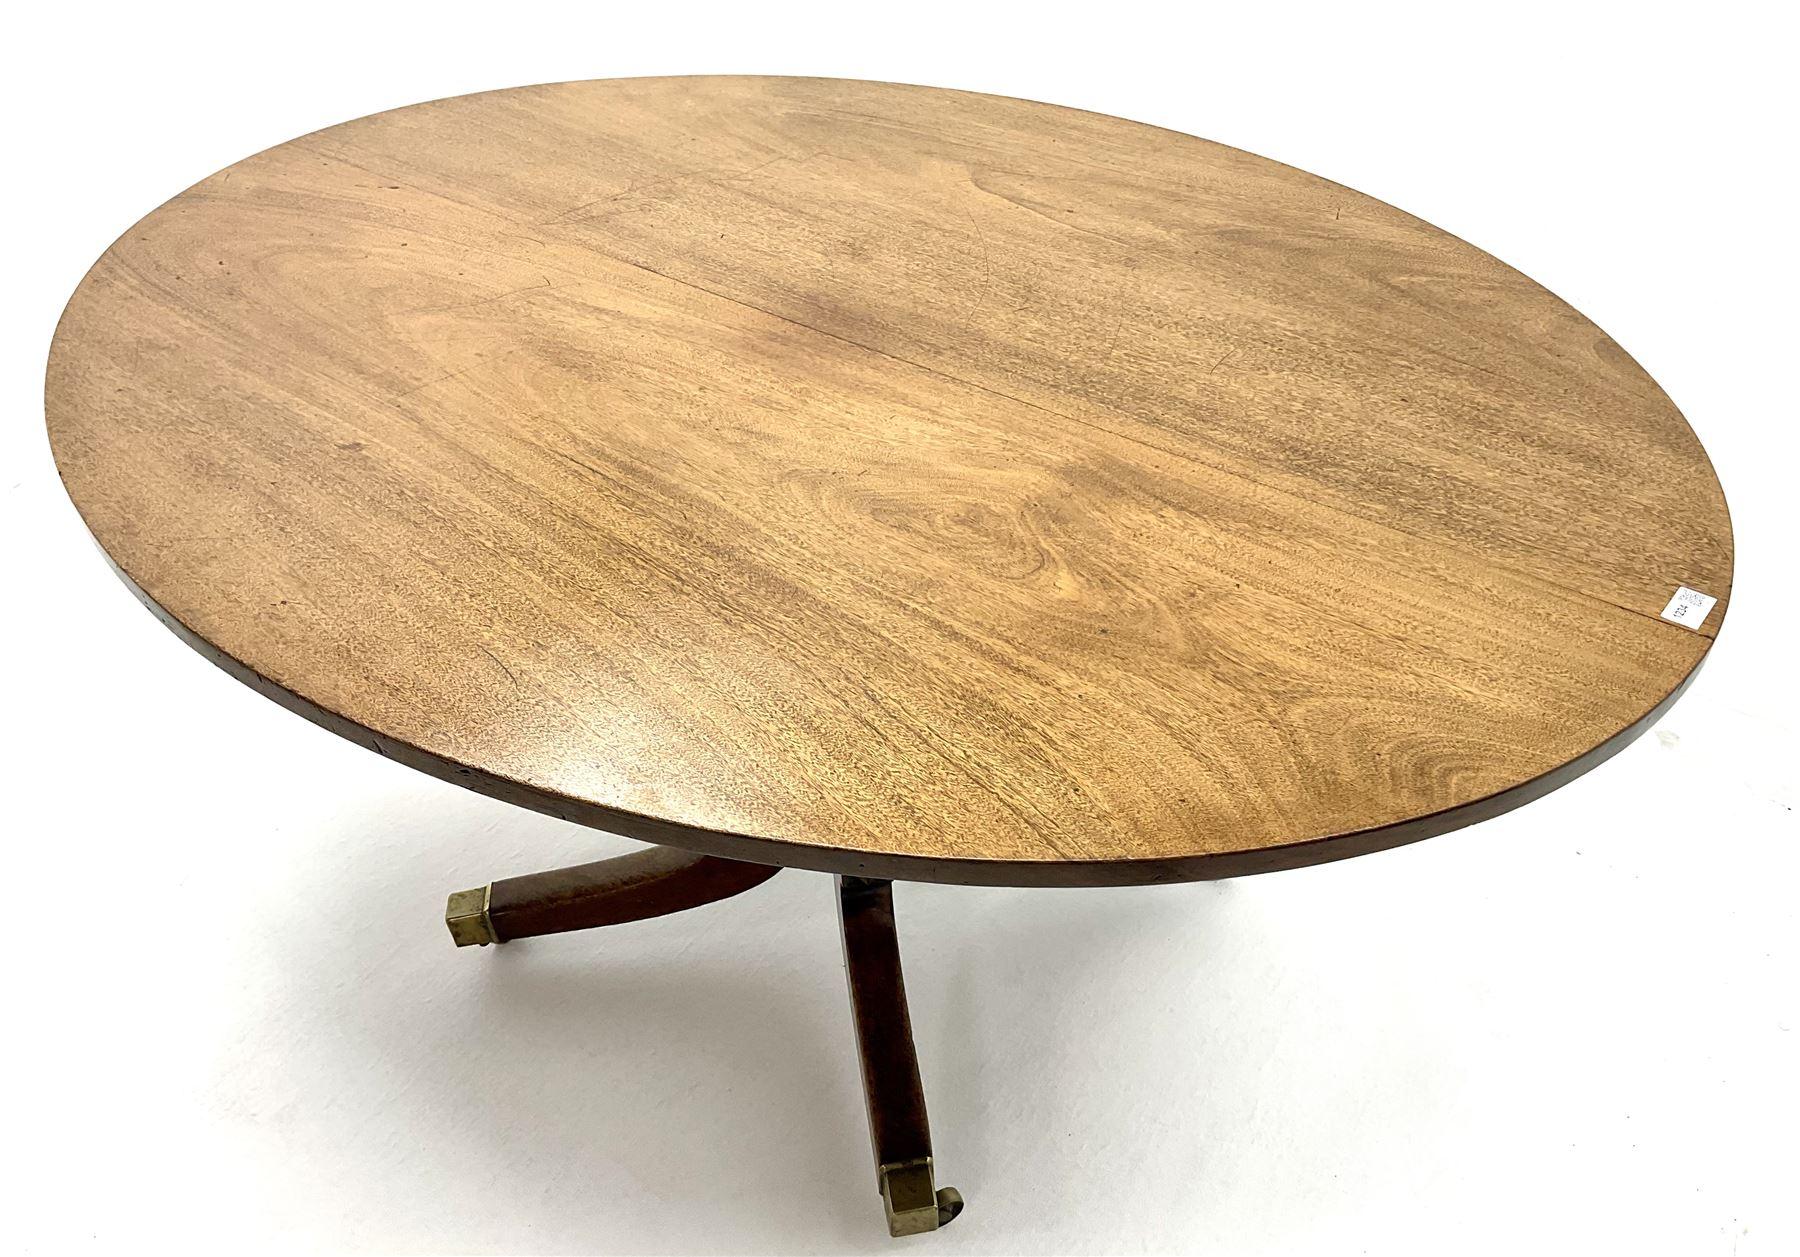 George III oval mahogany breakfast table - Image 2 of 4